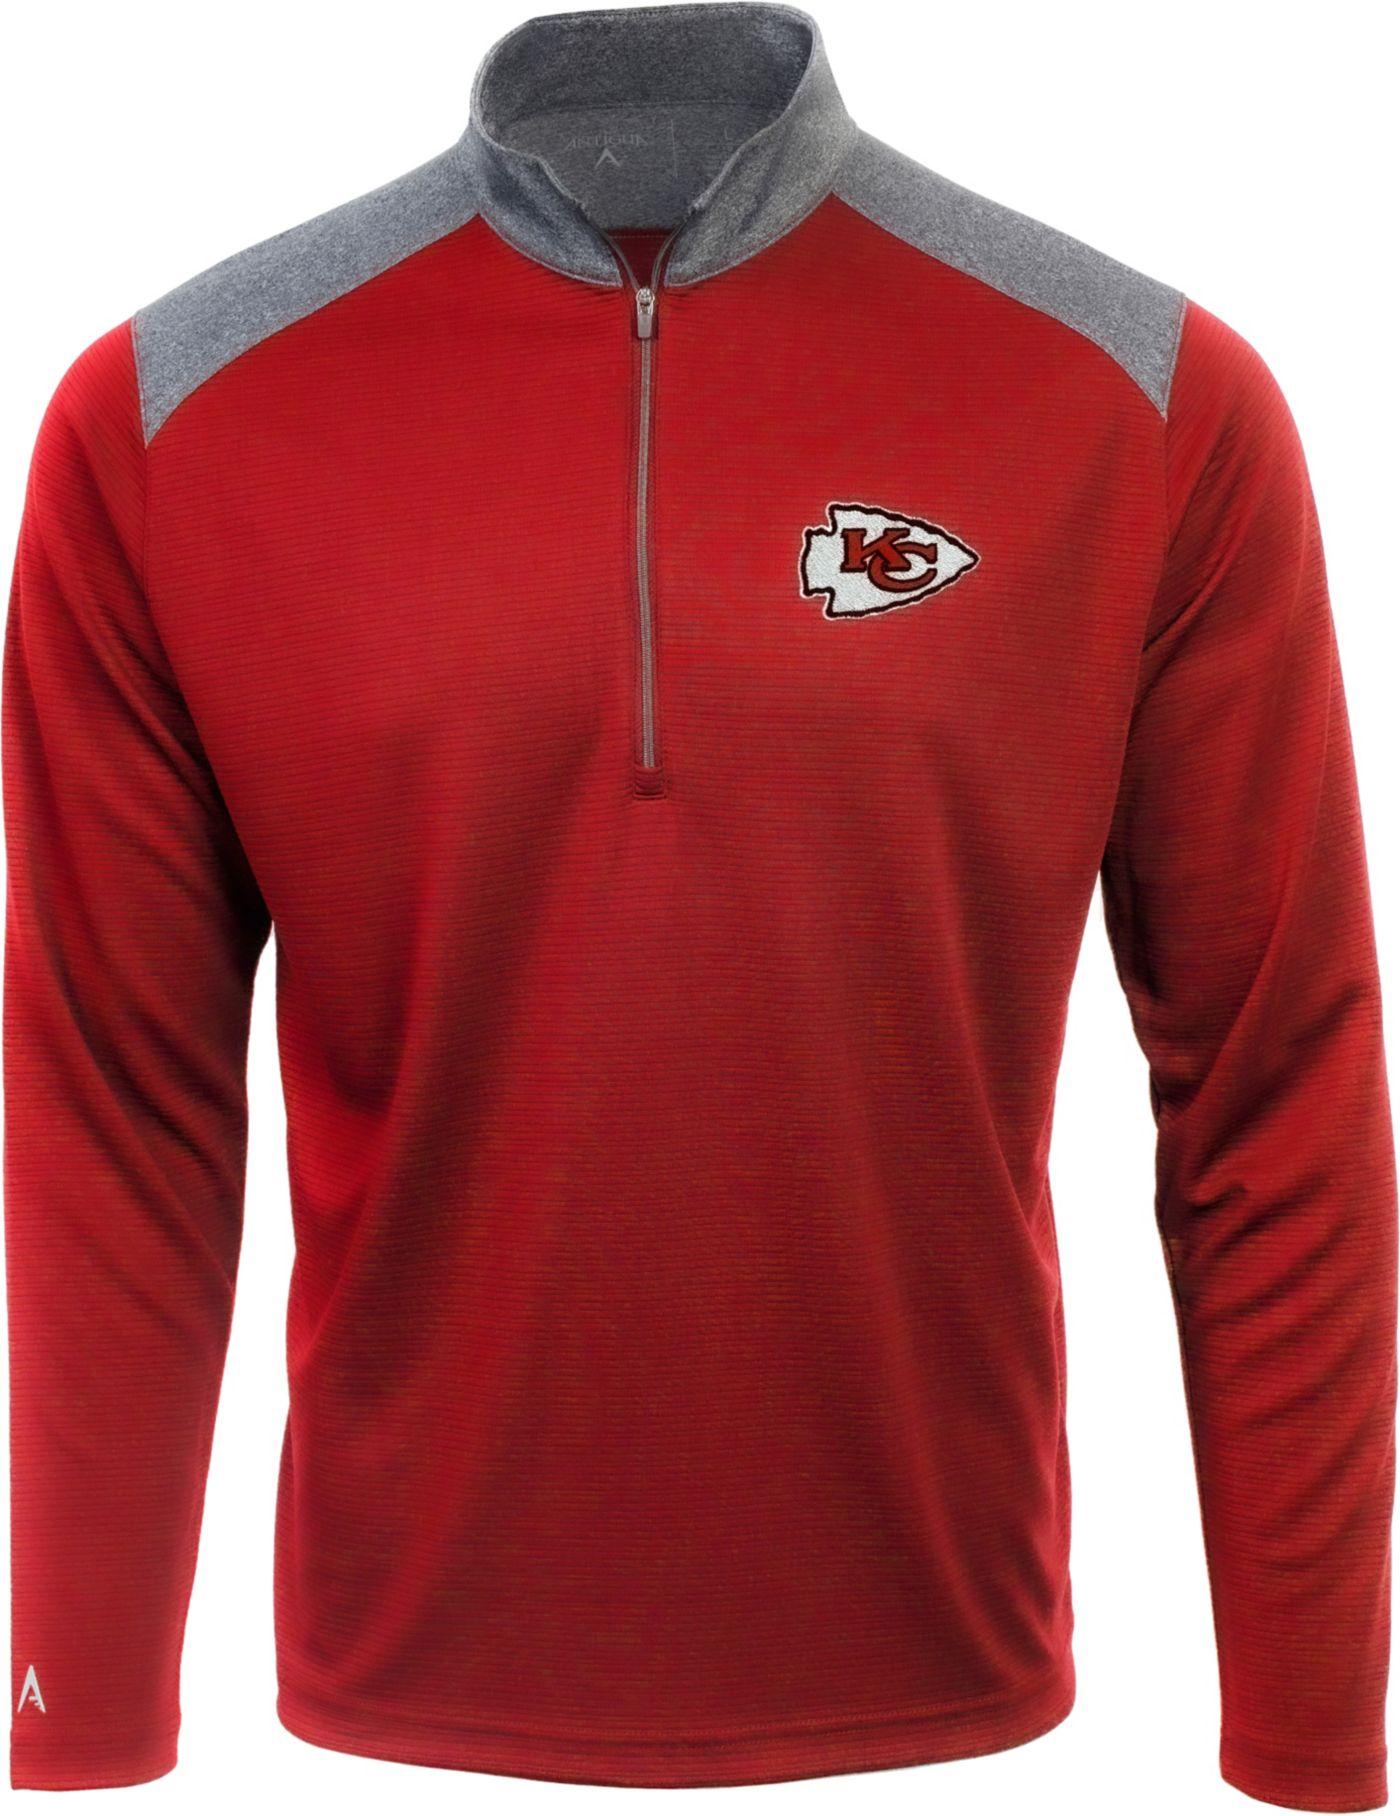 Antigua Men's Kansas City Chiefs Velocity Red Quarter-Zip Pullover